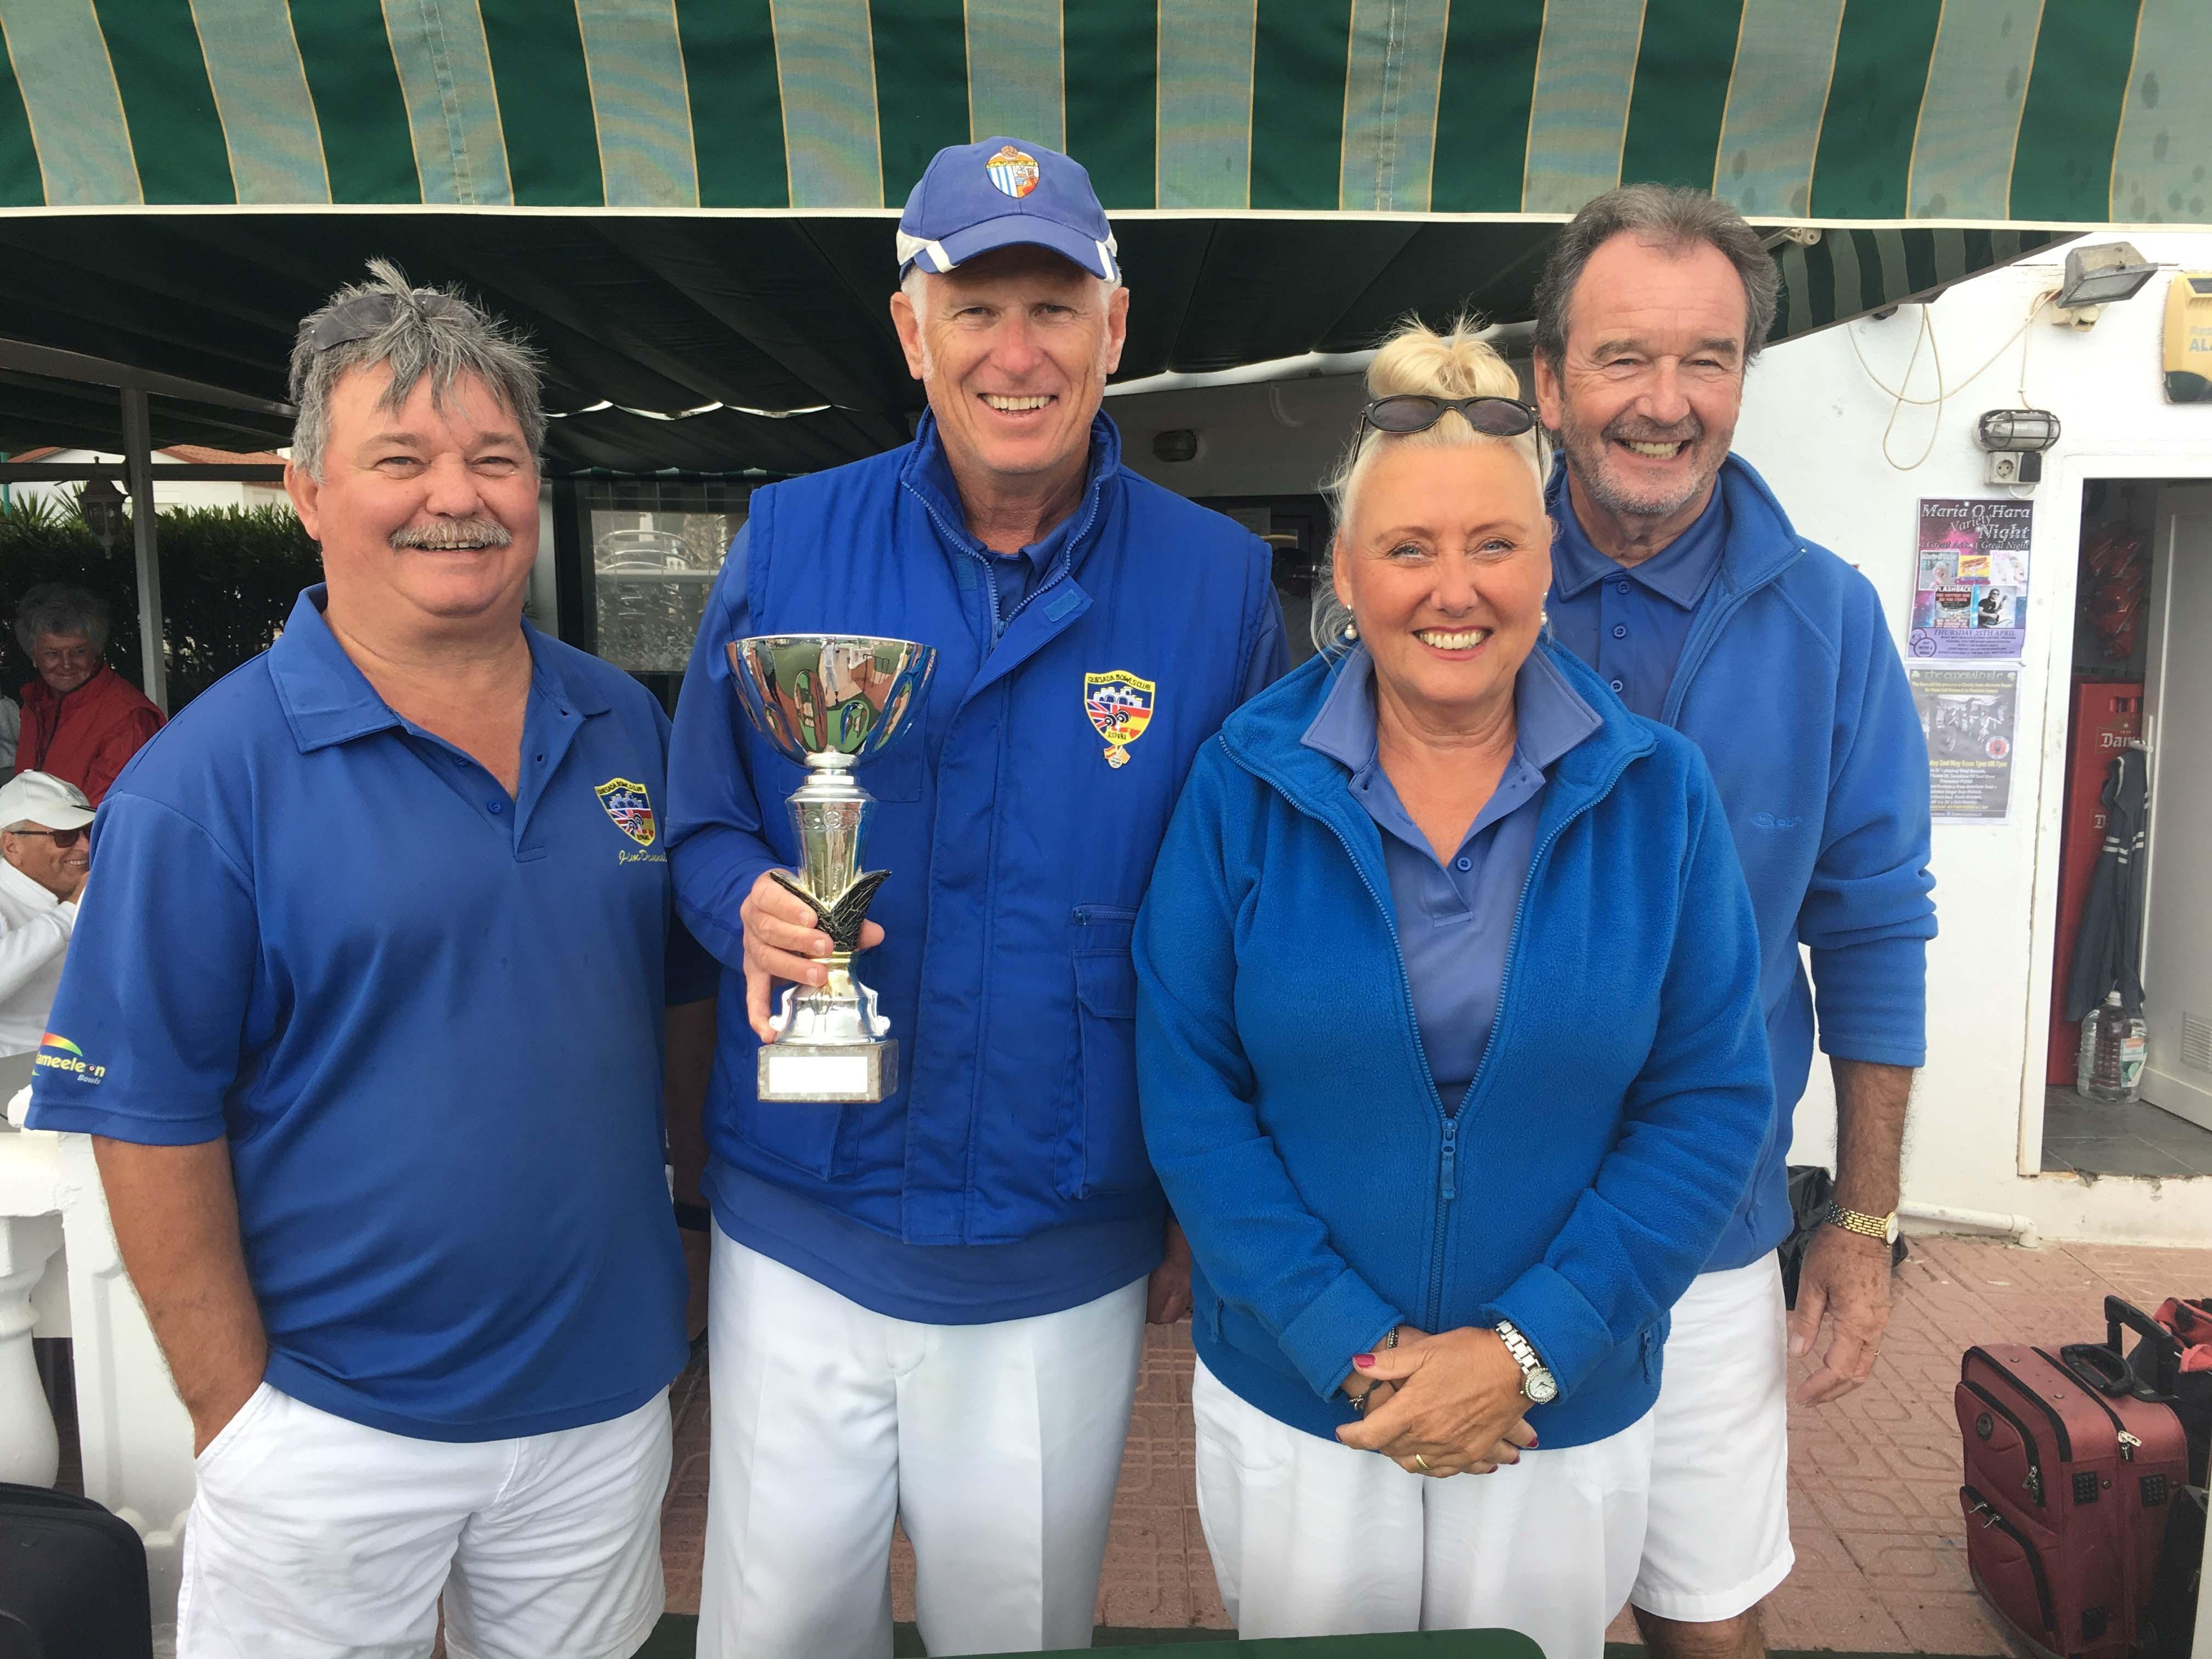 Les McCracken Memorial Trophy best visitors winners - Jim Donnelly, Steve Hibberd, Dee Stephenson, John Stephenson